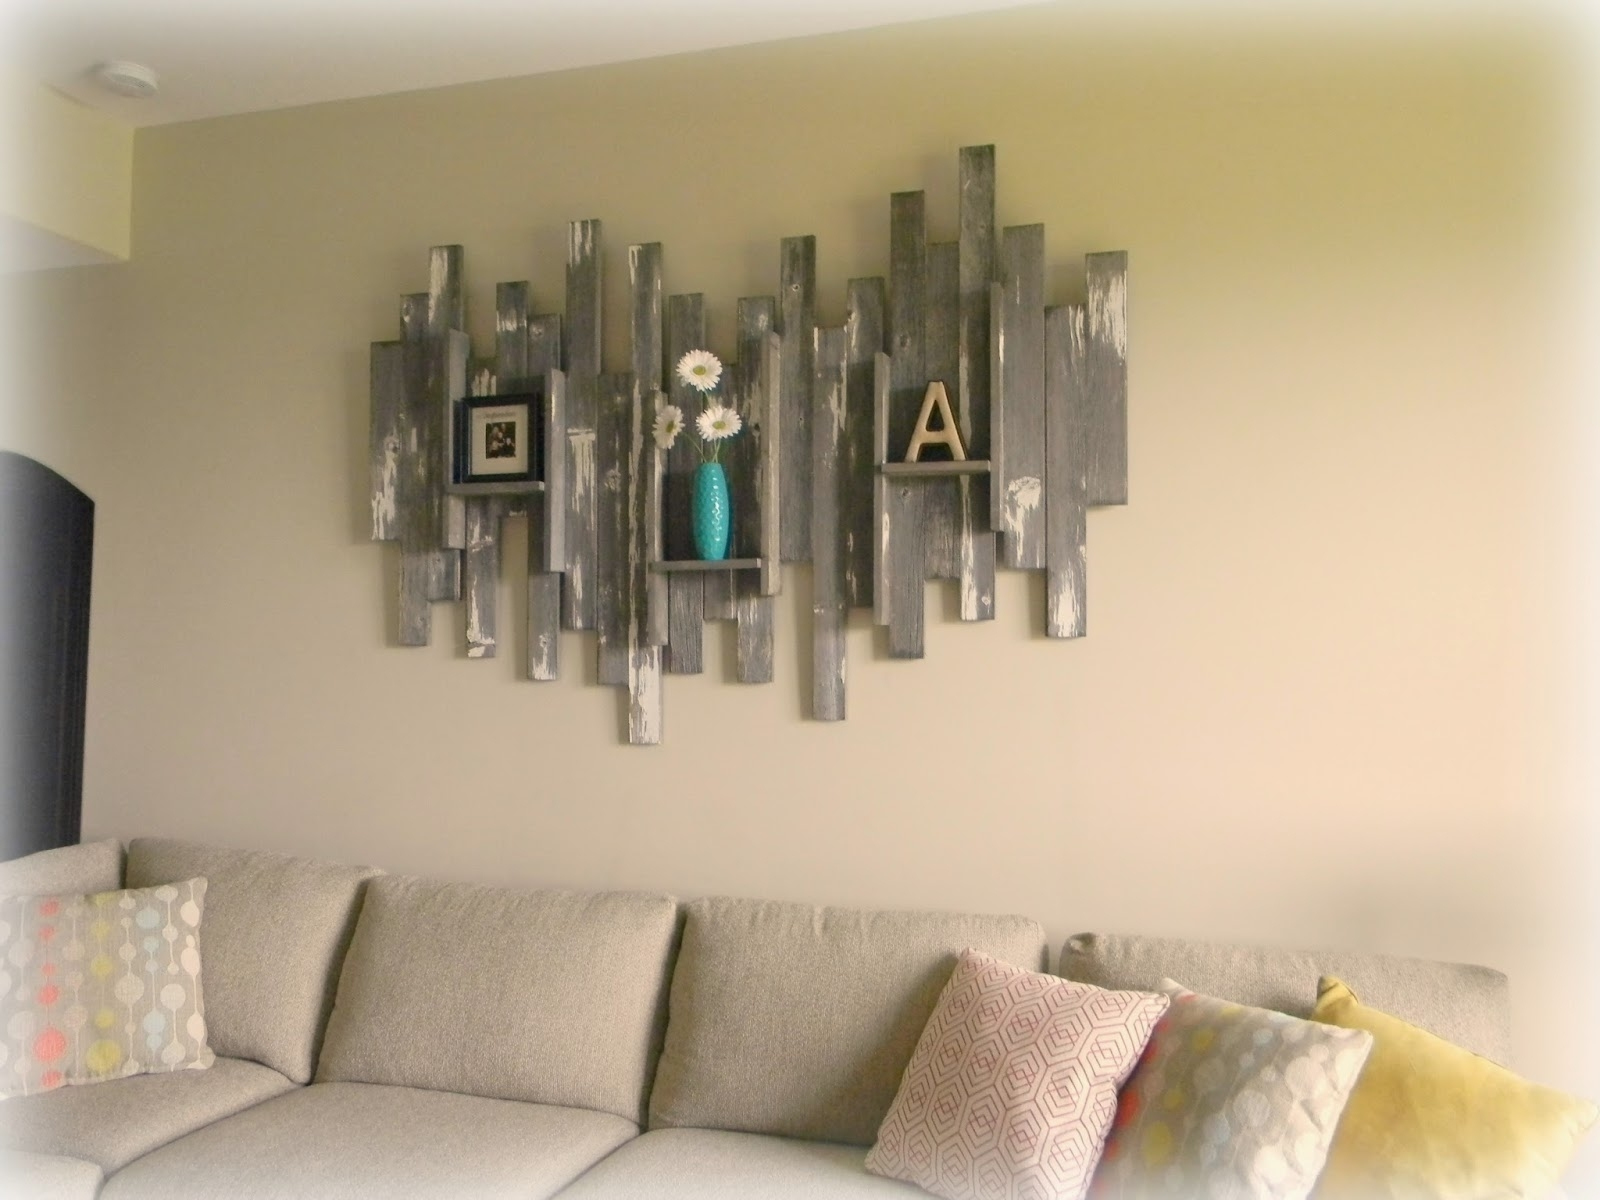 Decorations. Modern Wall Decor Shelves Ideas: Wall Decor Shelves with regard to 2017 Rustic Fabric Wall Art